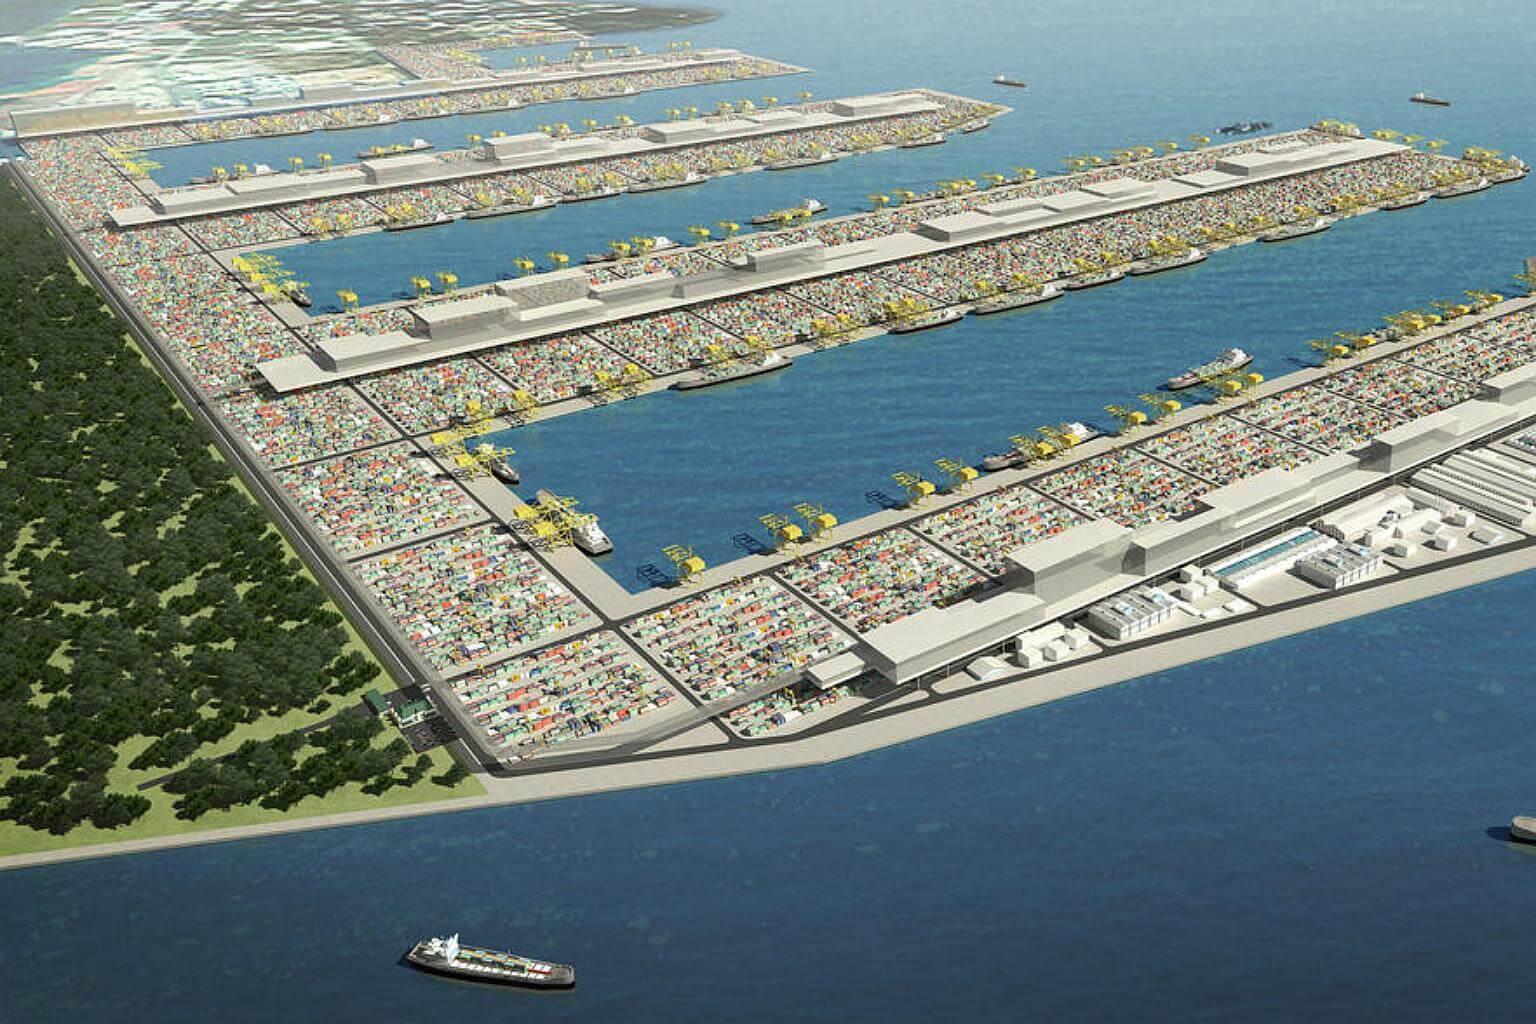 An artist's impression of the Tuas mega port. PHOTO: MPA